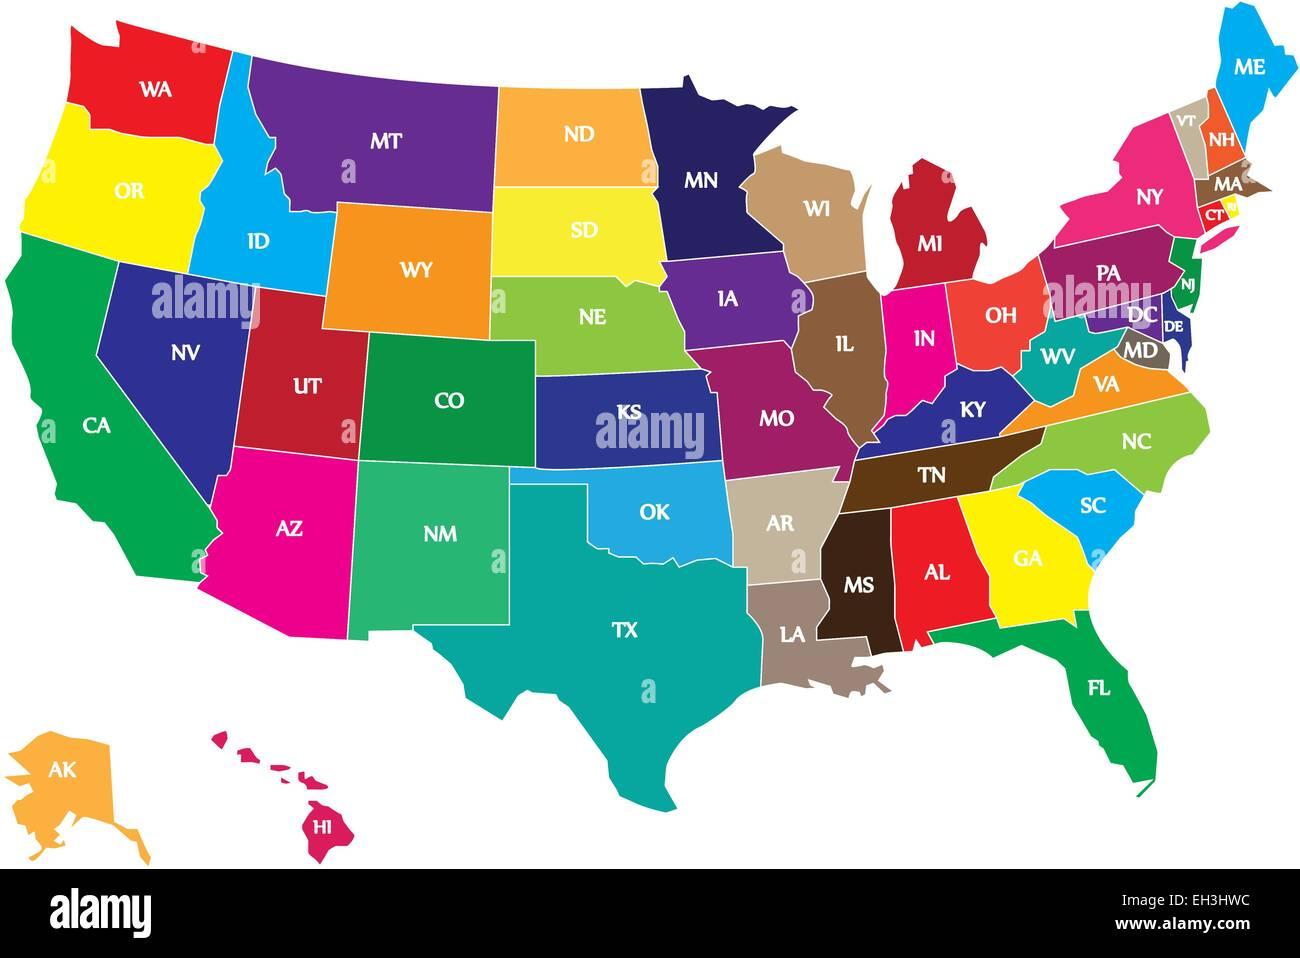 Usa Map Stockfotos & Usa Map Bilder - Alamy